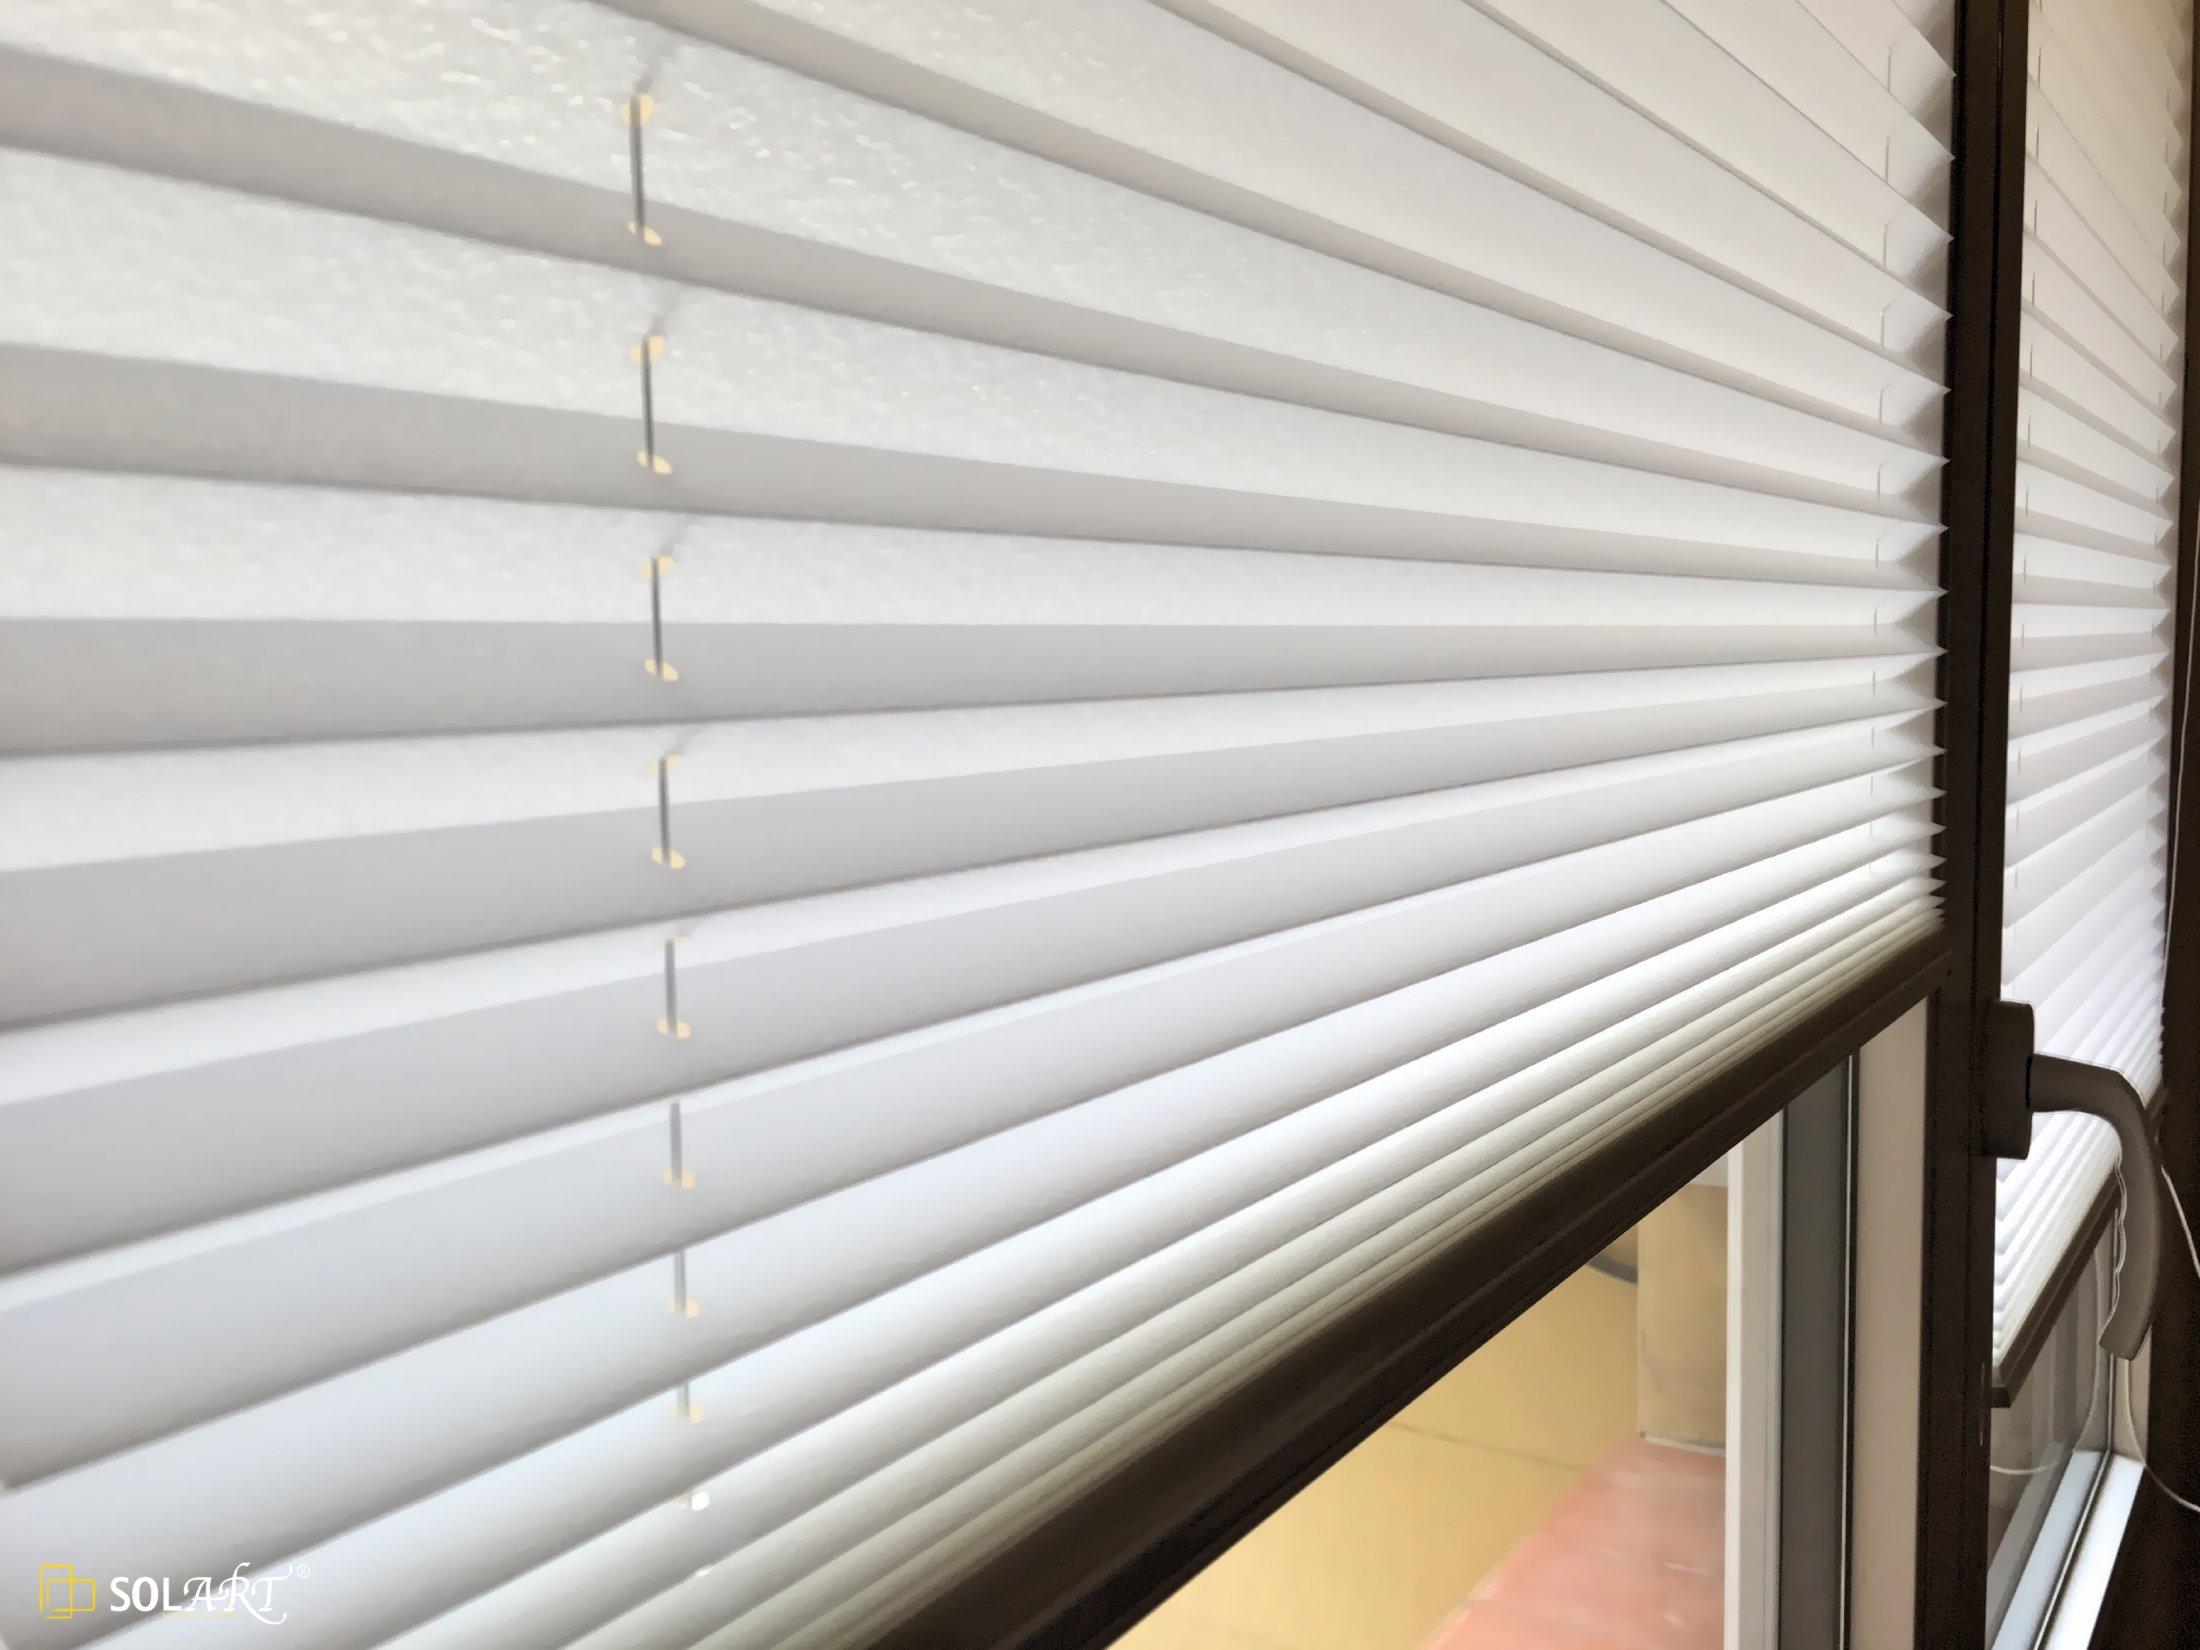 Cortinas plisadas solart 33 solart - Comprar cortinas barcelona ...